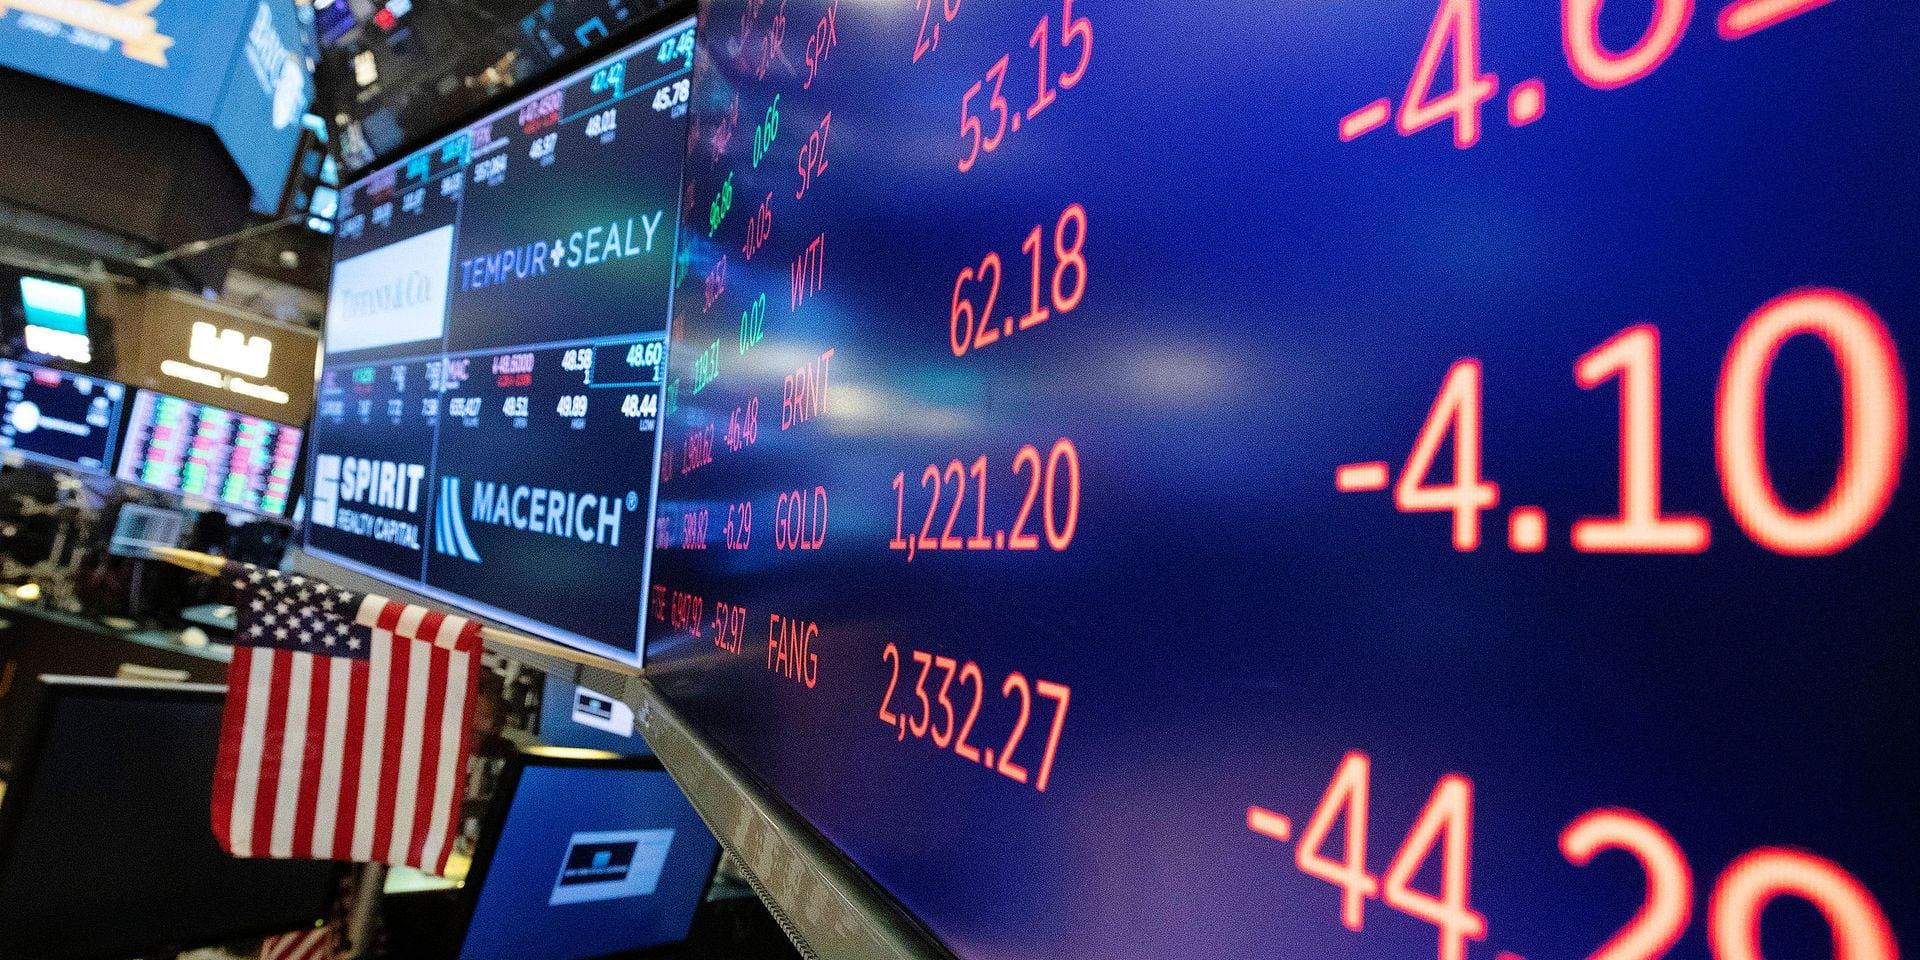 La Bourse négocie le futur